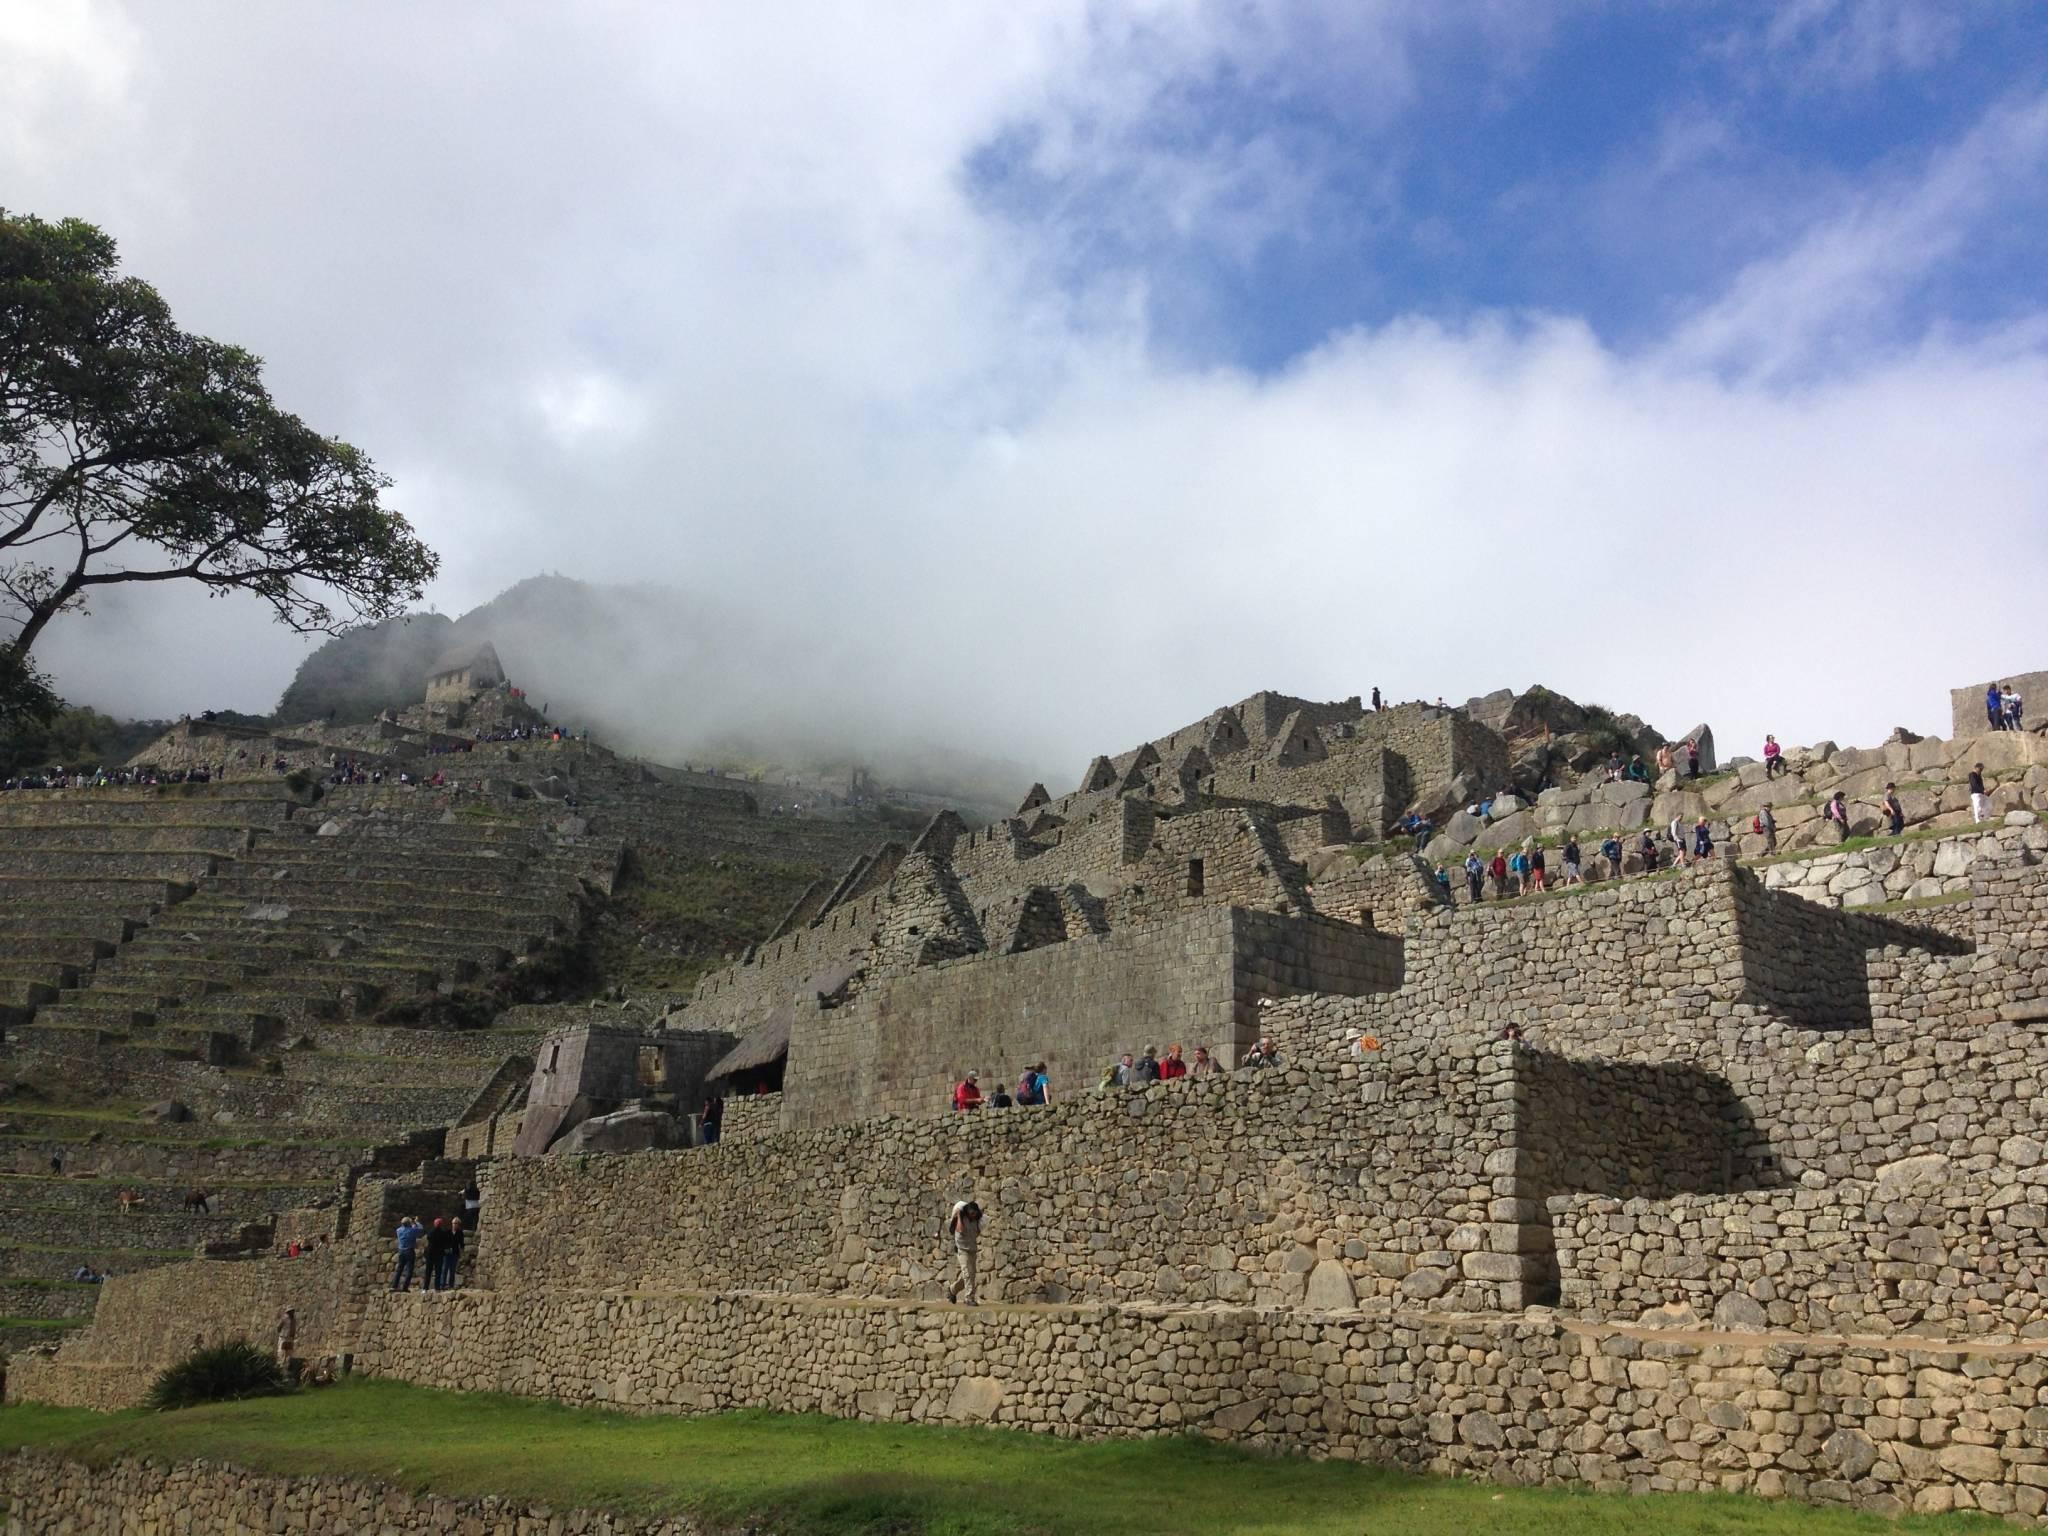 Machu Picchu Nerede? Machu Picchu'ya Nasıl Gidilir?